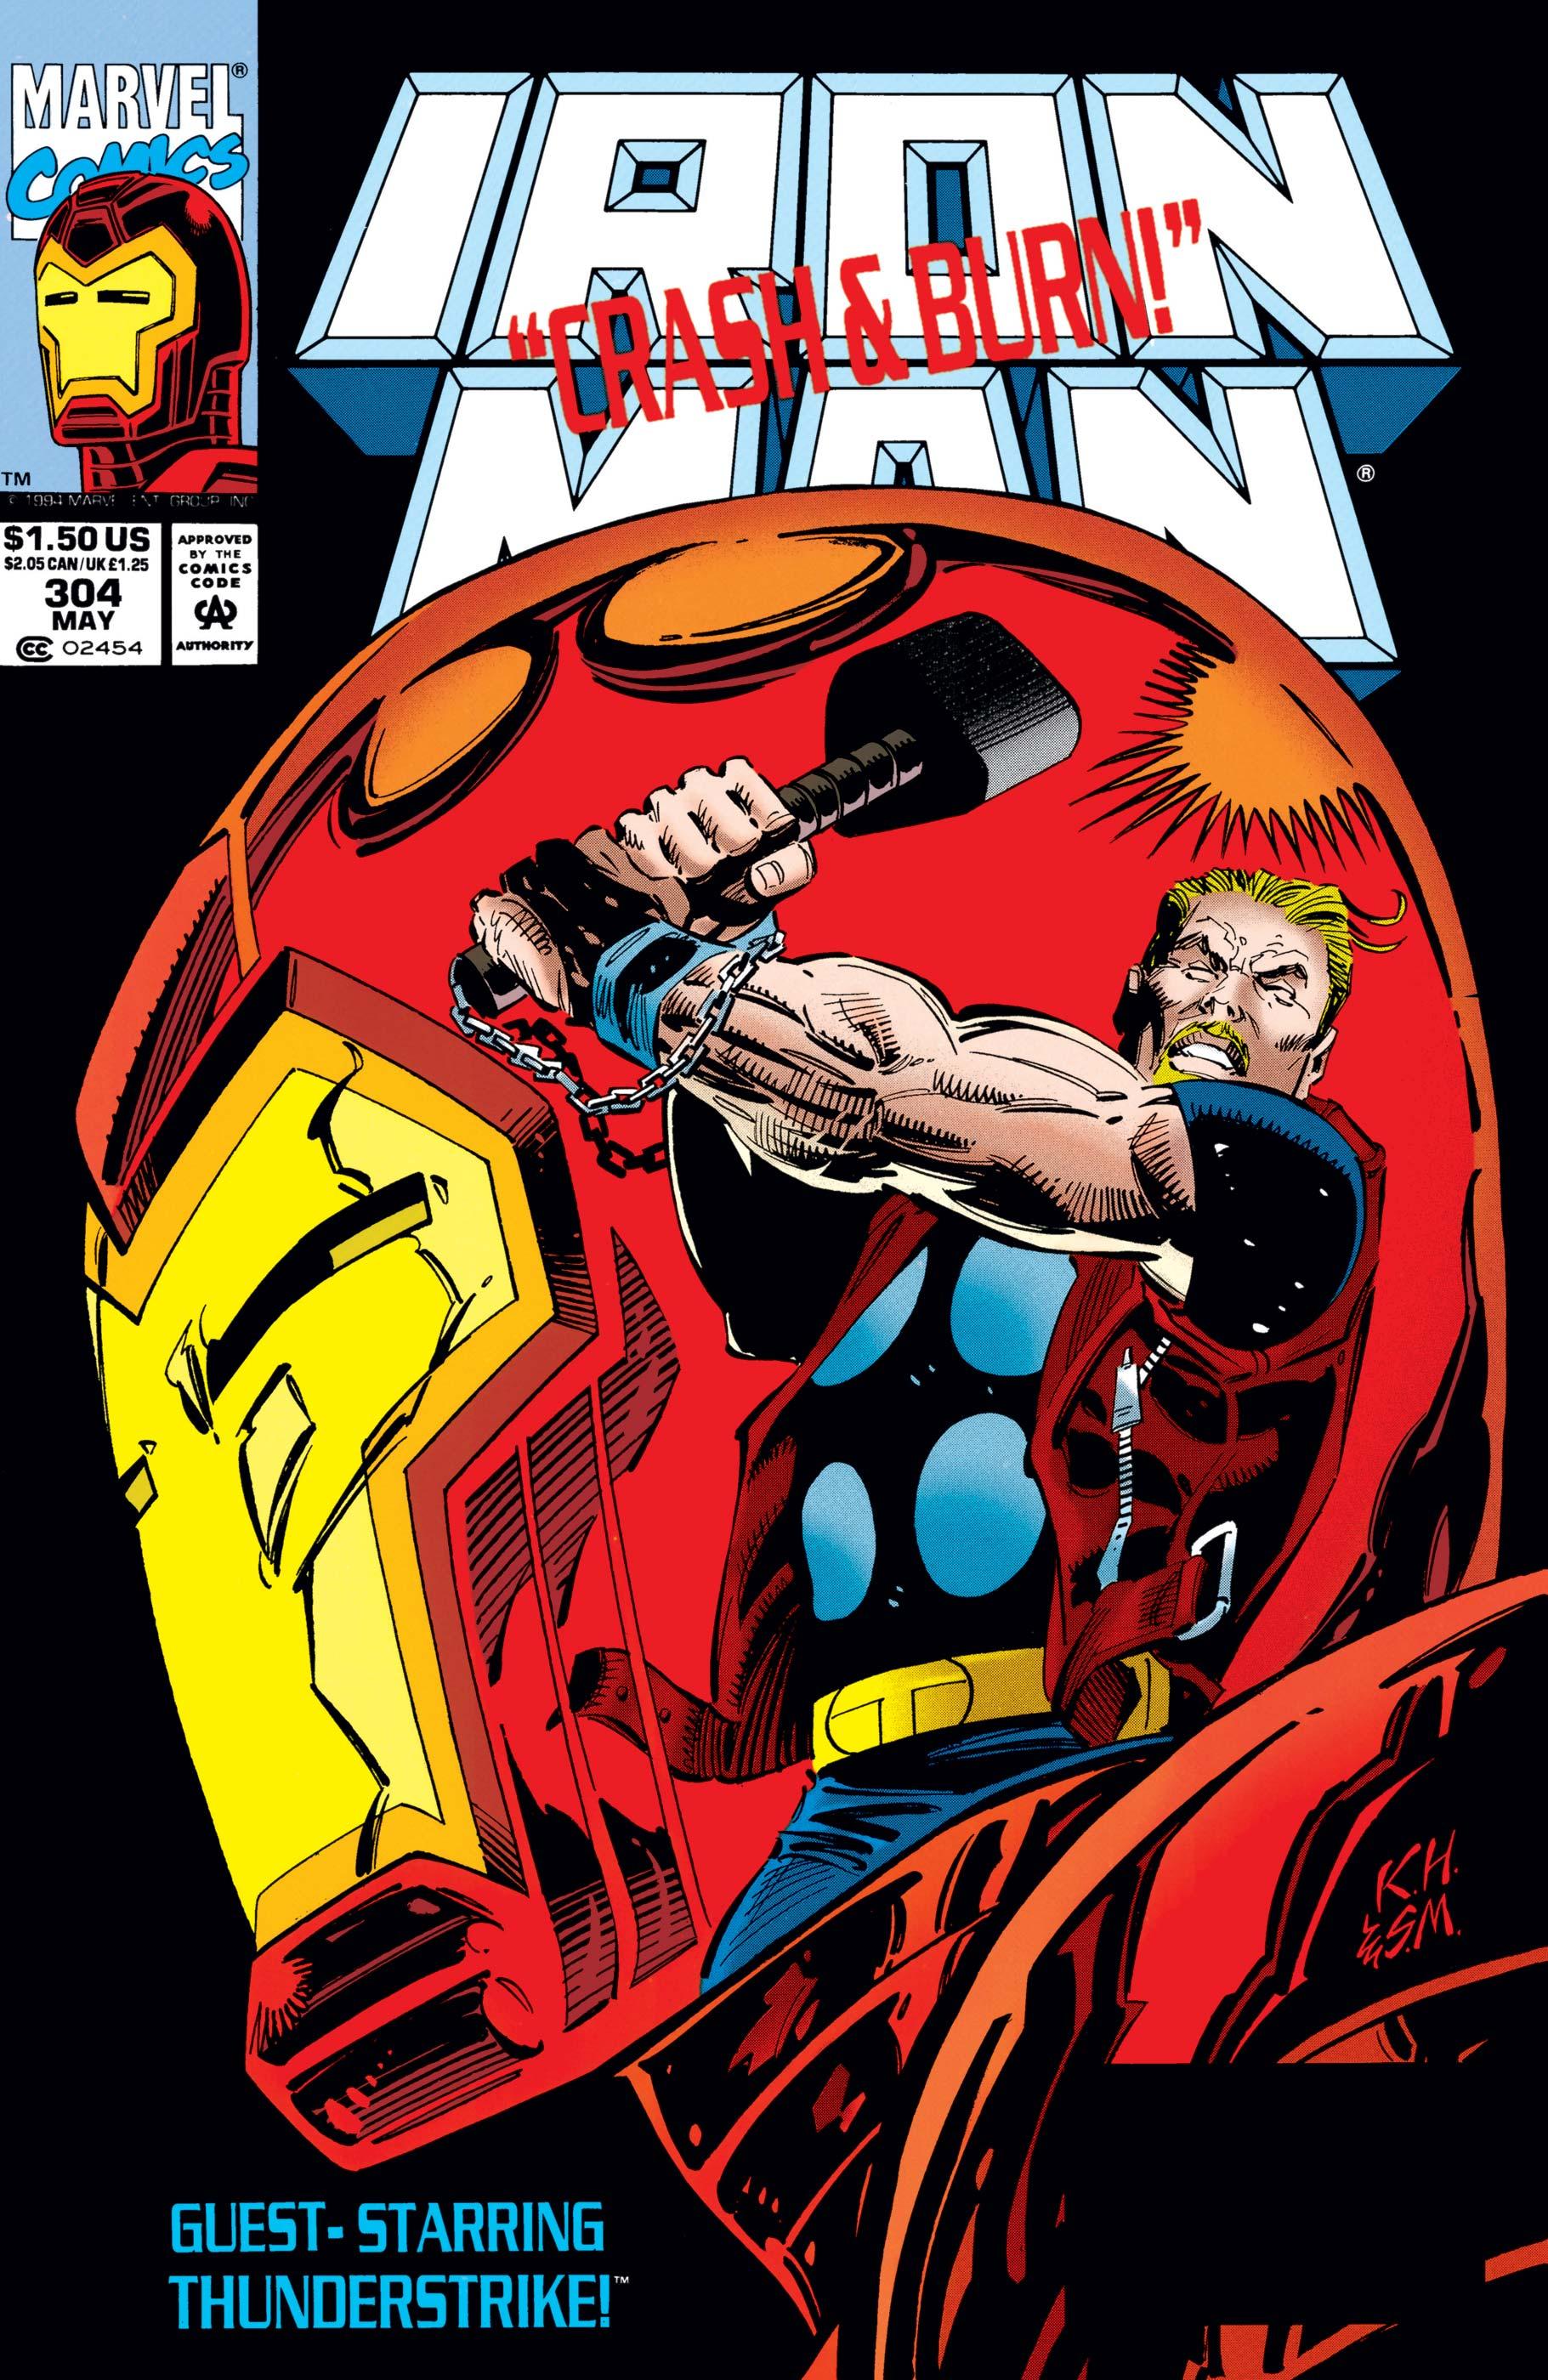 Iron Man (1968) #304